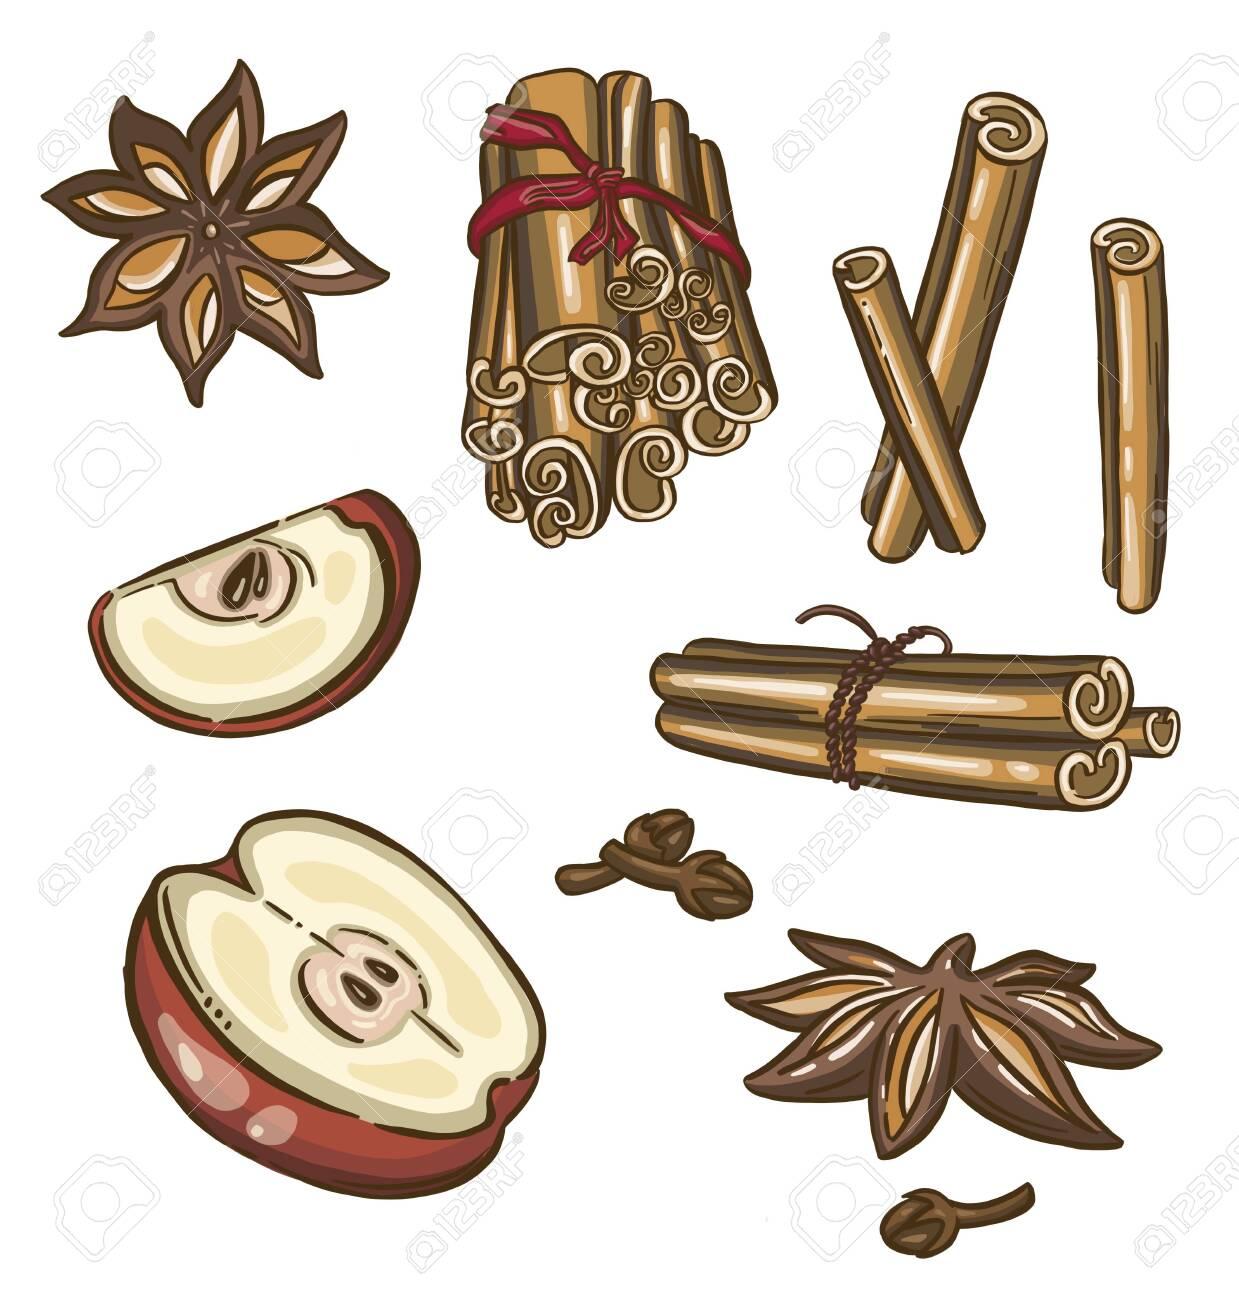 Christmas spices, star anise. Vector illustration - 156928109